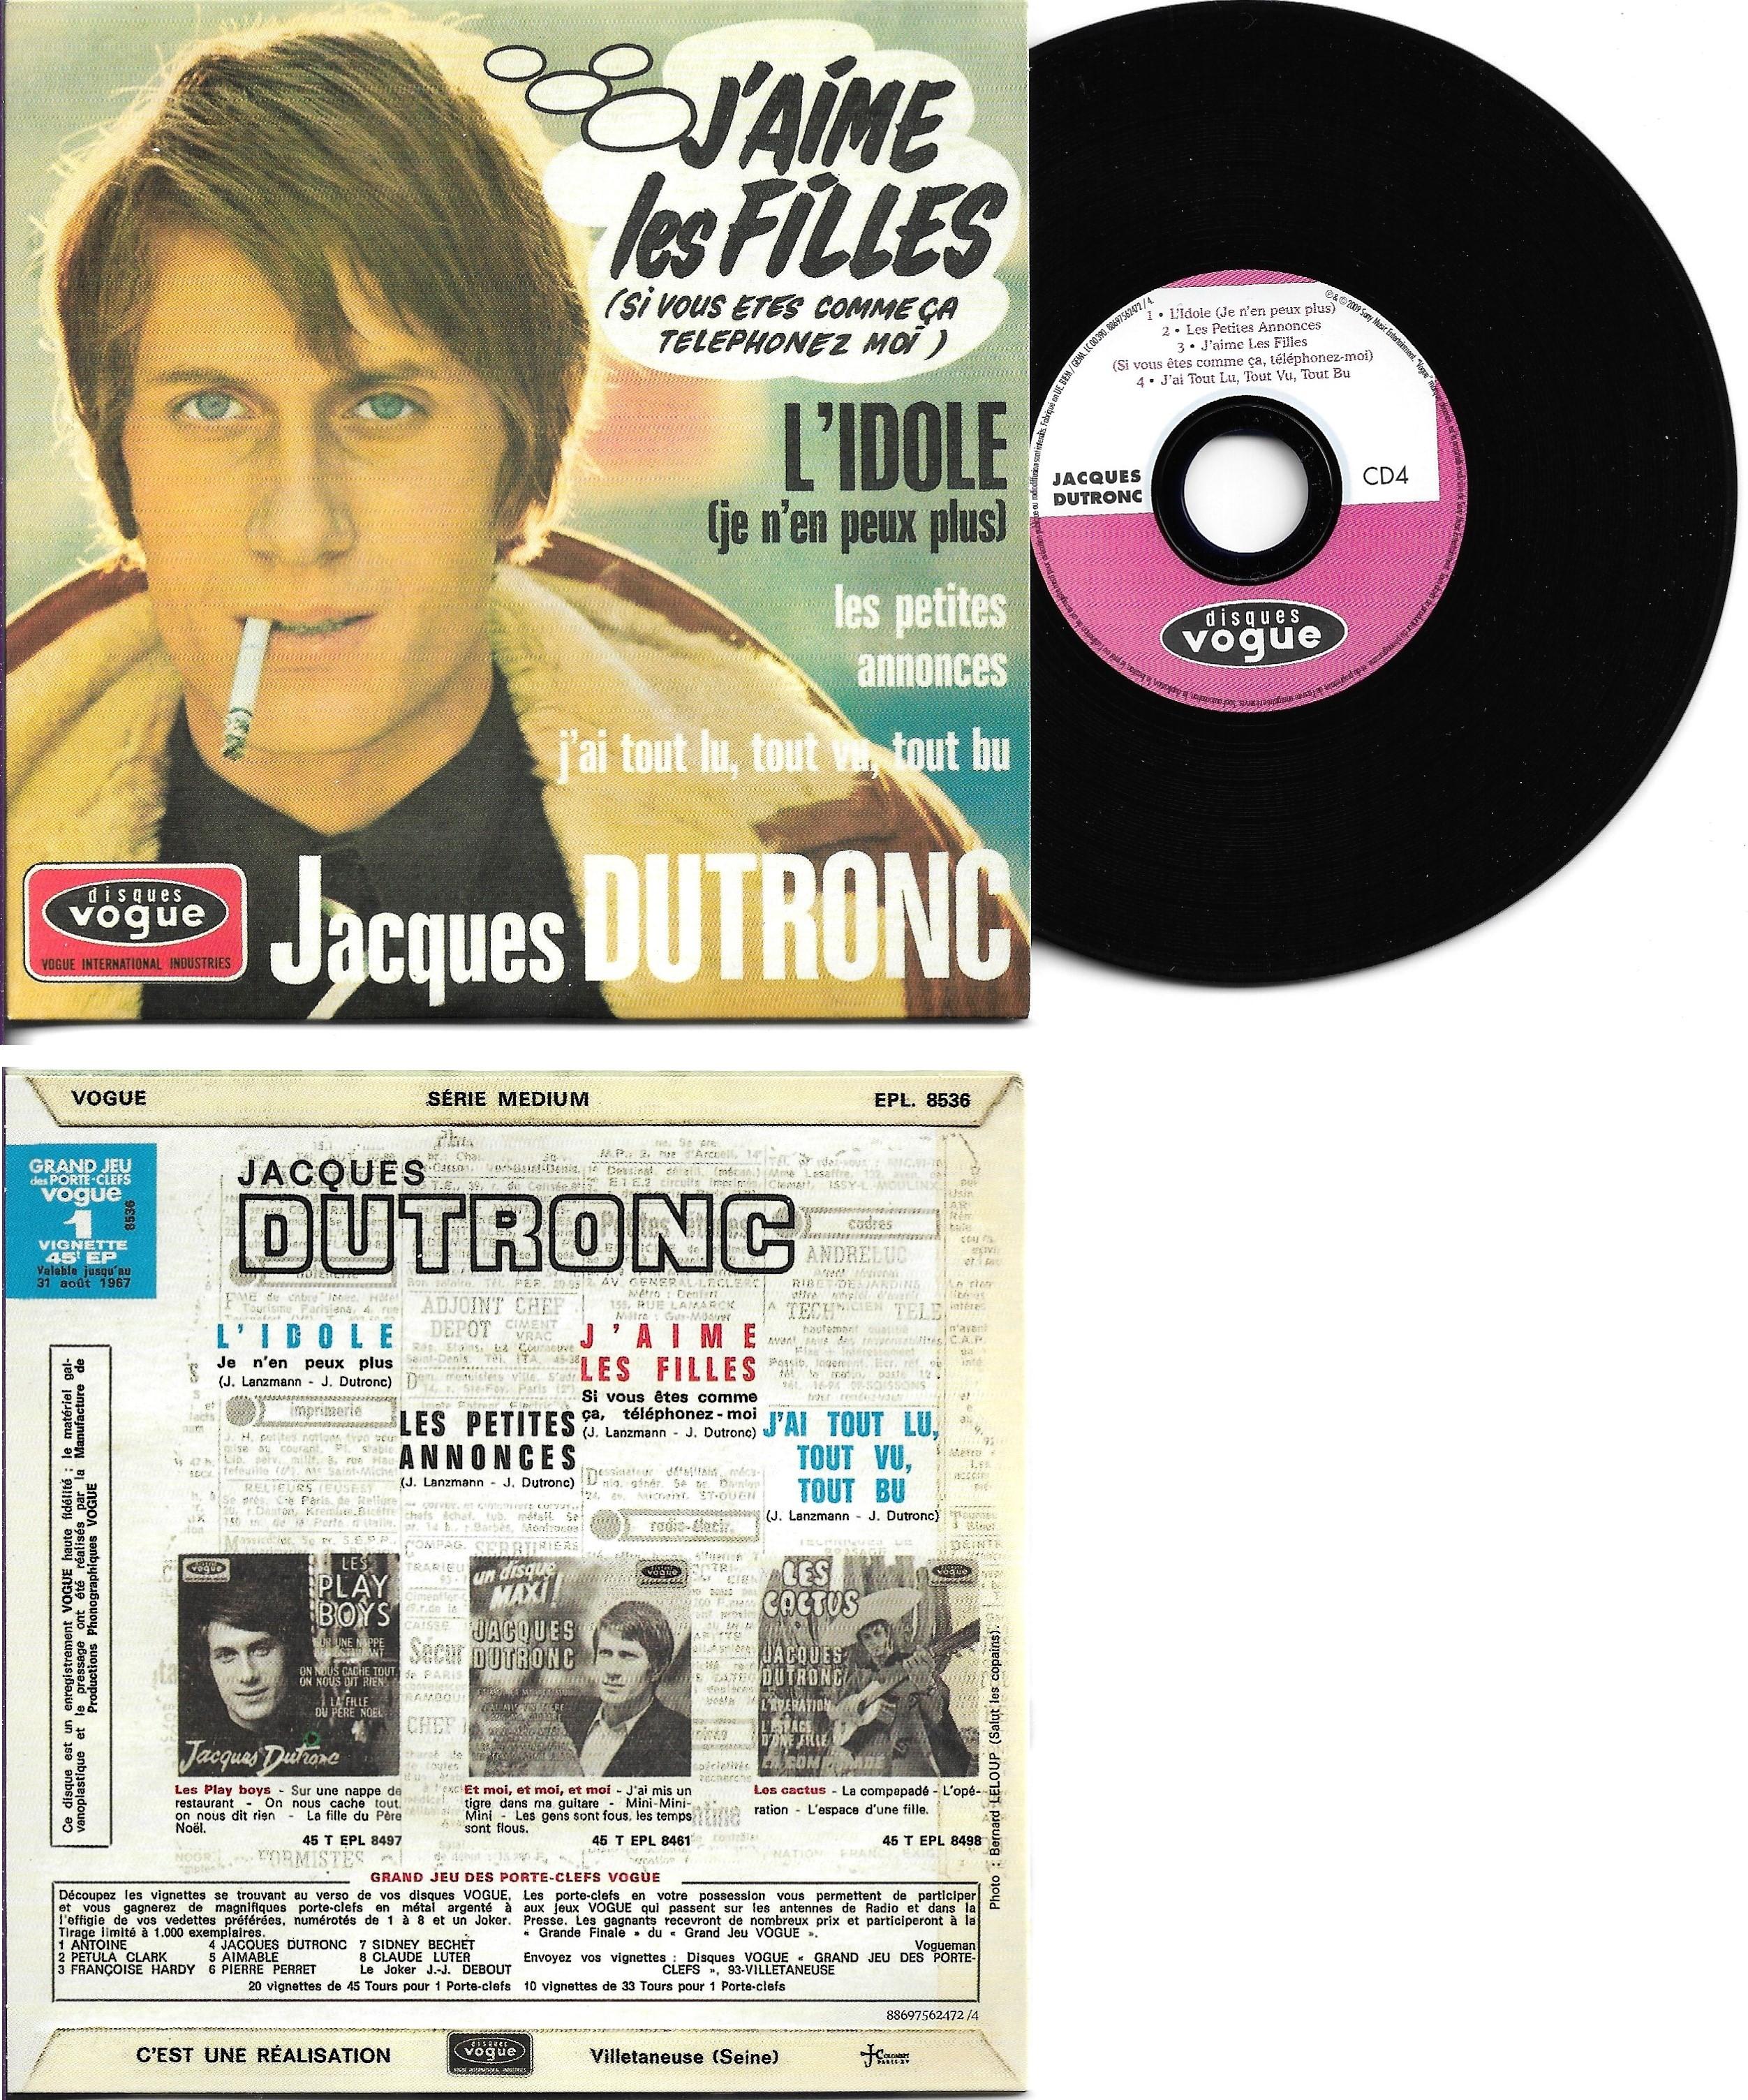 JACQUES DUTRONC - J'aime les filles EP REPLICA  4-TRACK CARD SLEEVE - CD single